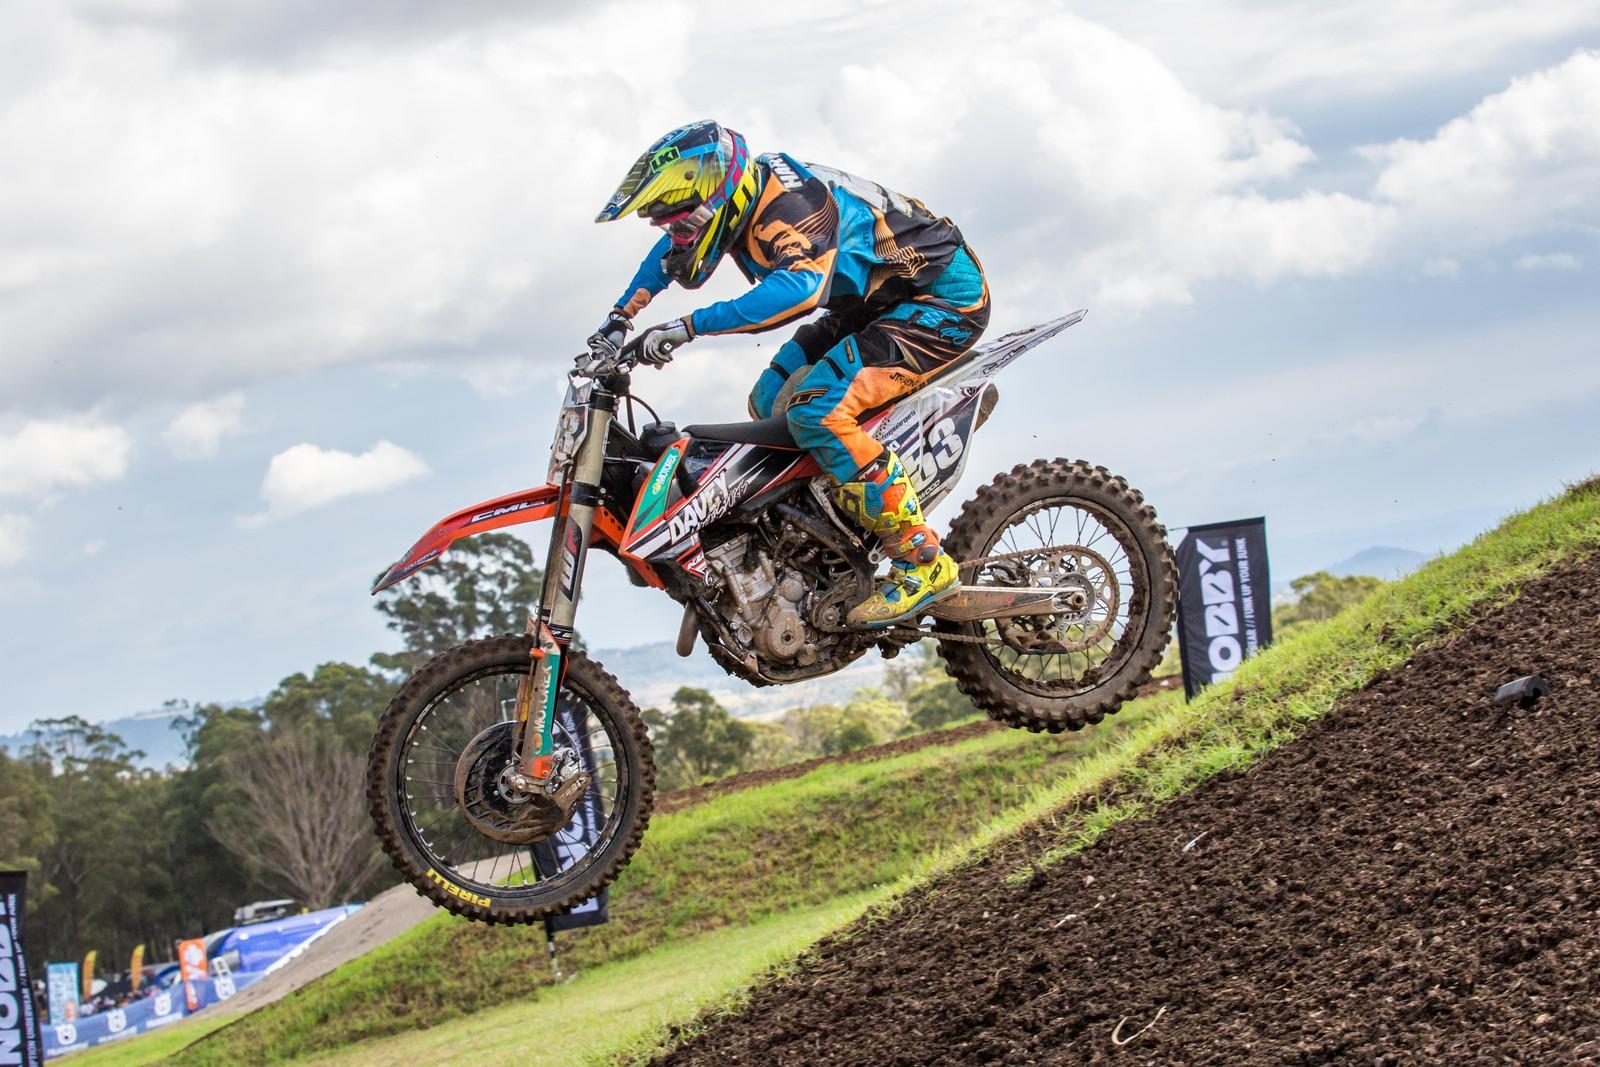 Hamish Harwood - Australian Motul Motocross Nationals Round 2, Appin - Motocross Pictures - Vital MX